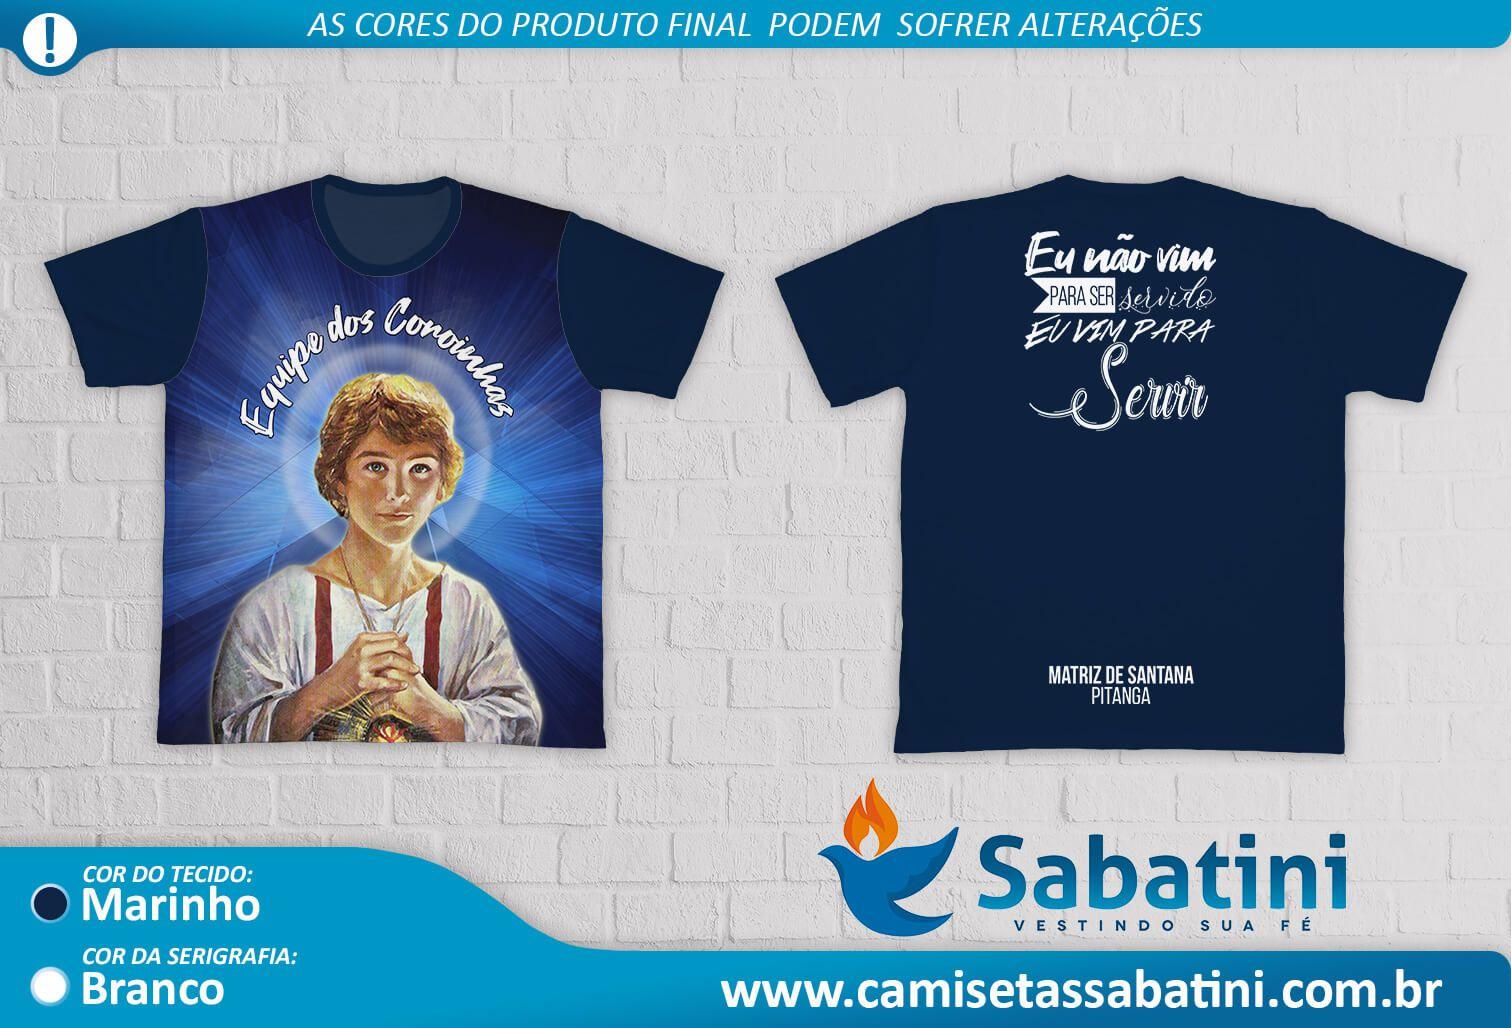 Camiseta Personalizada - PASTORAL DOS COROINHAS - MATRIZ DE SANTANA\PR\PITANGA- ID13994914  - Camisetas Sabatini